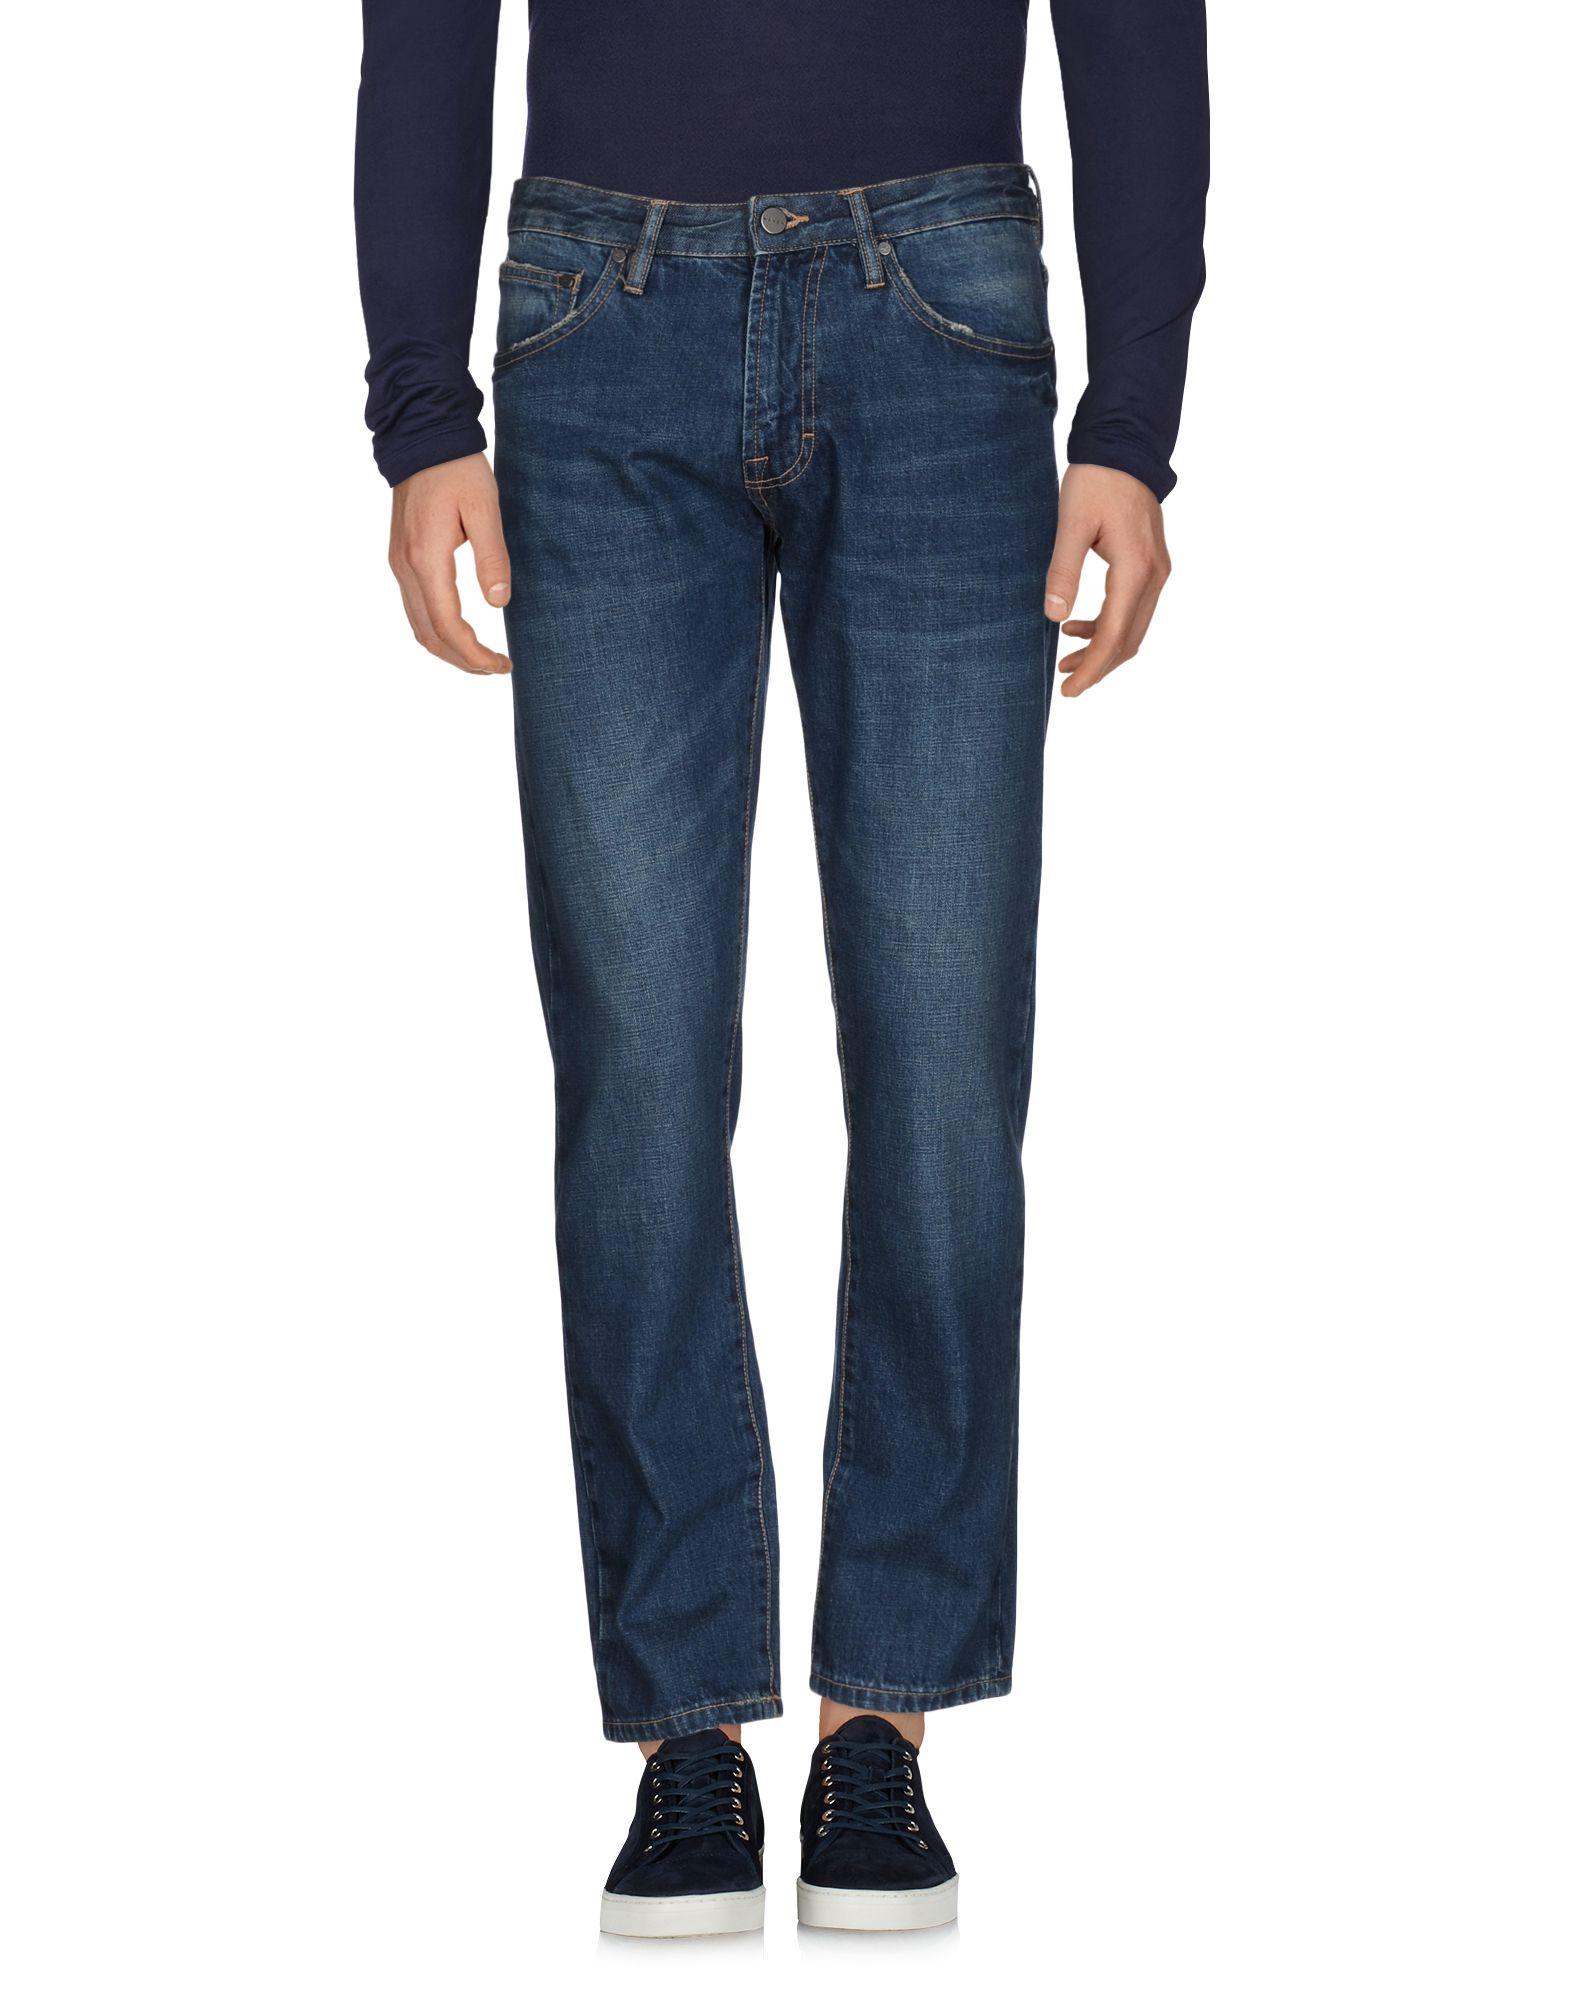 WÅVEN Джинсовые брюки dismero джинсовые брюки